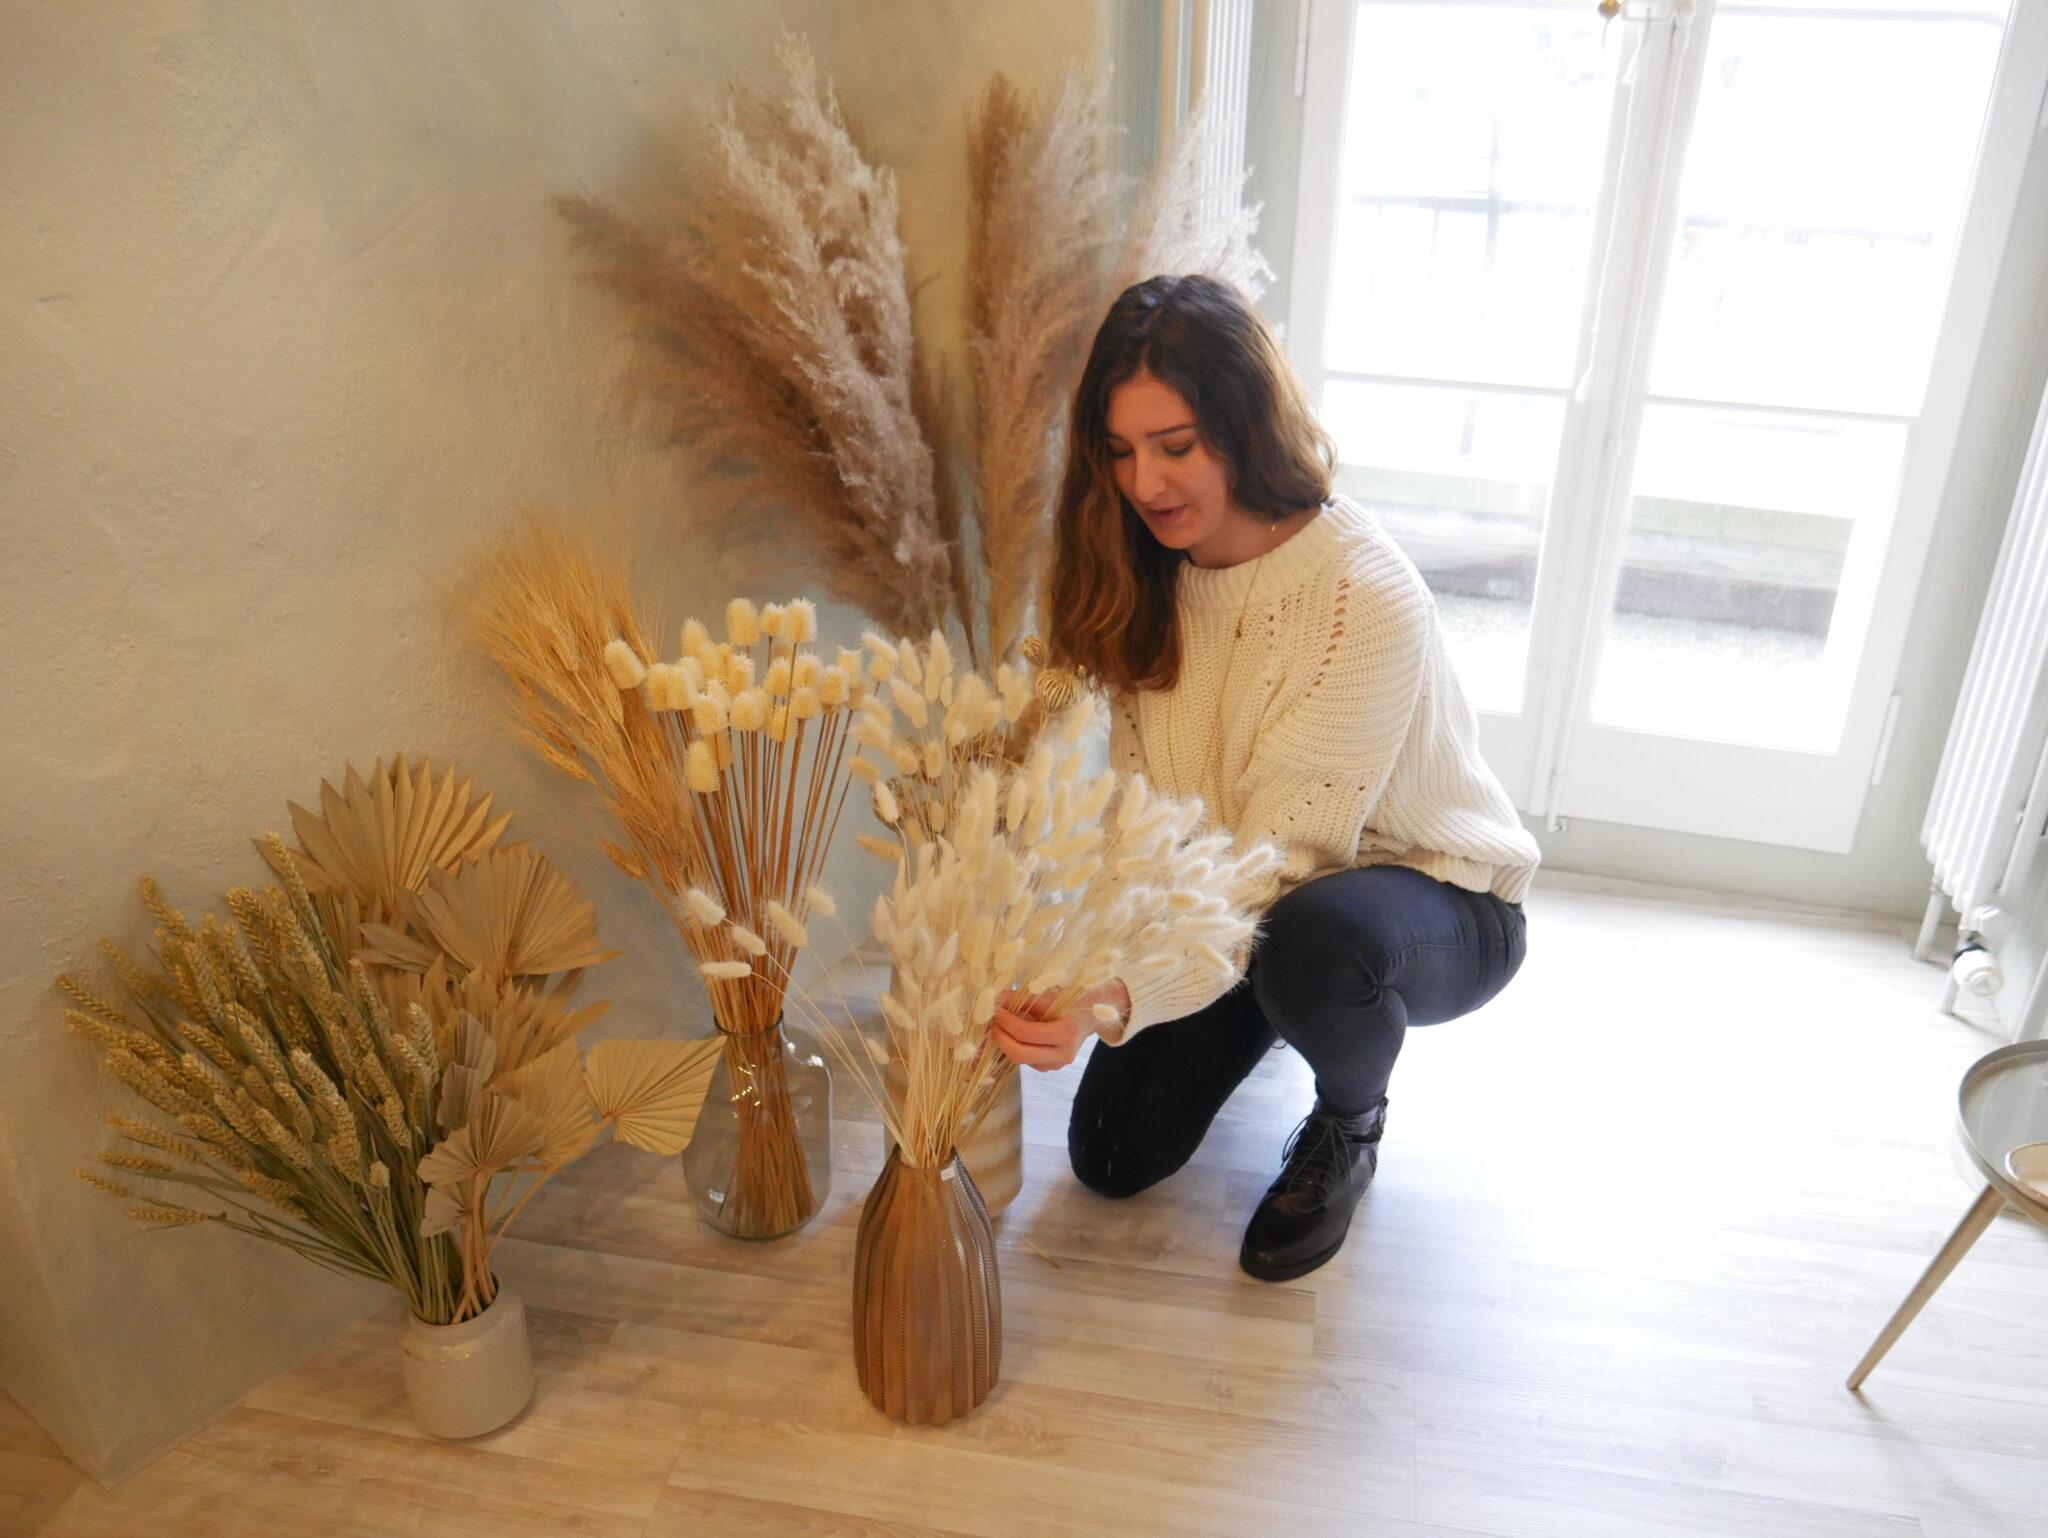 plantiful Jennifer und Trockenpflanzen